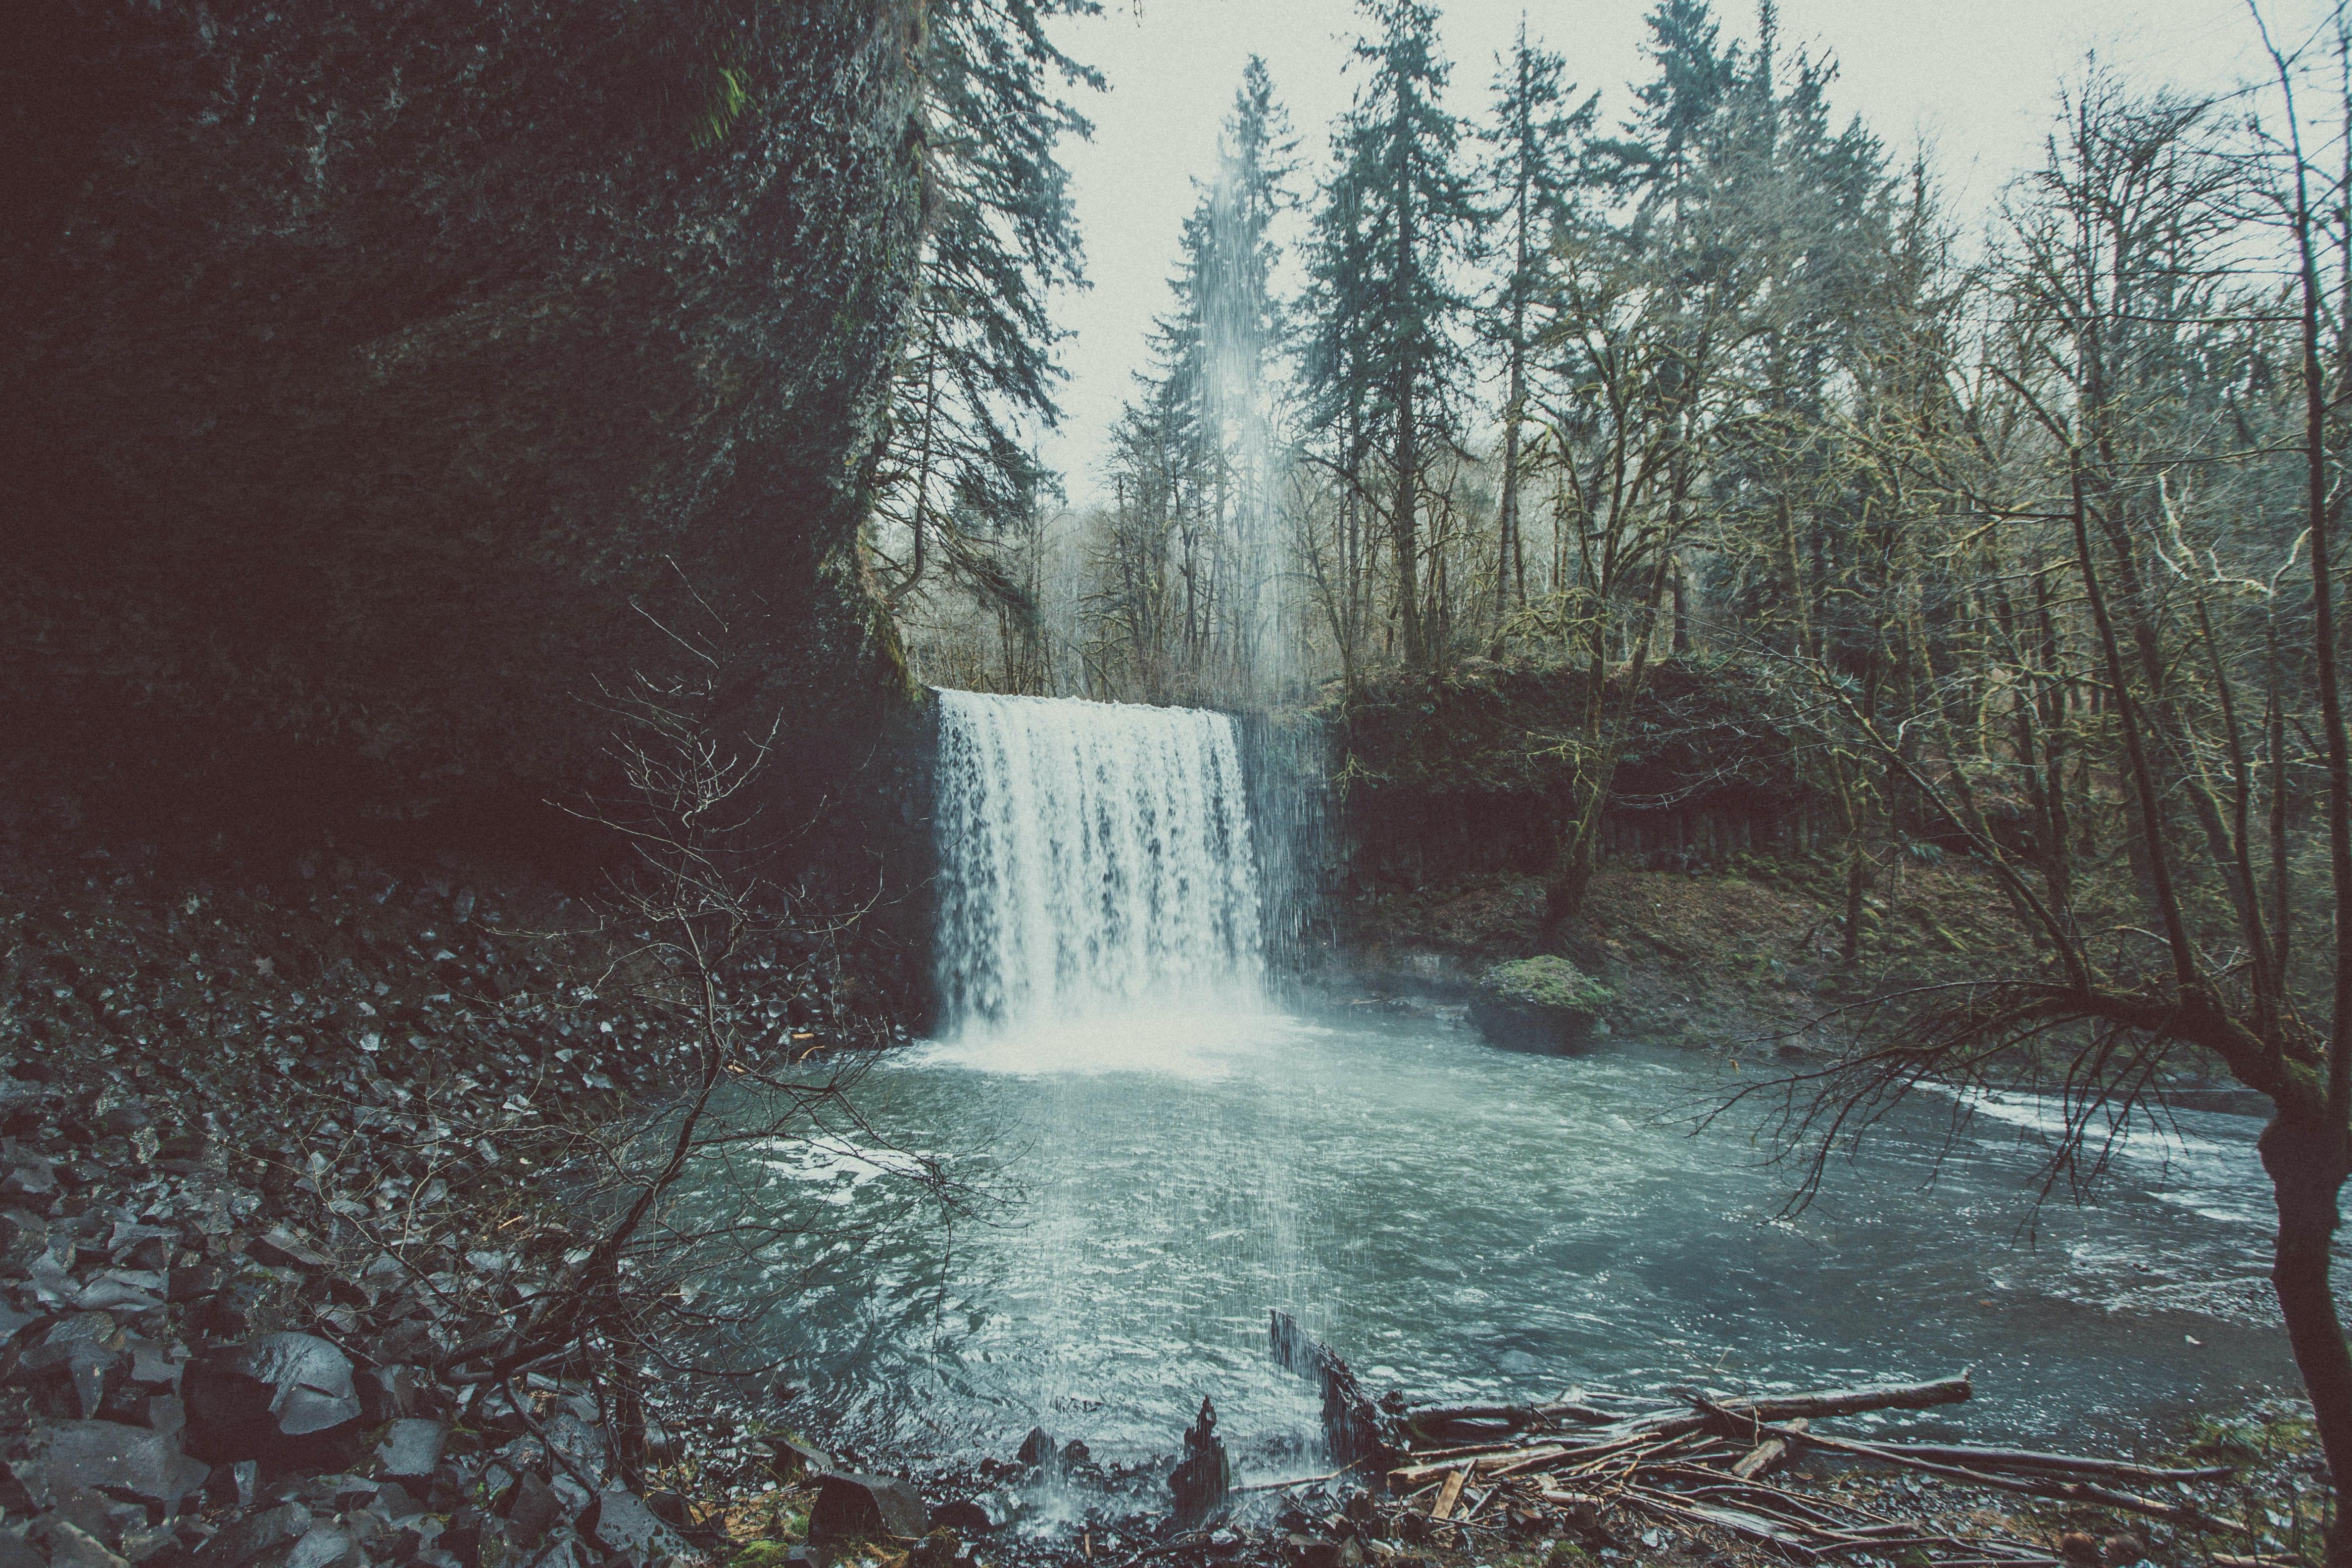 Landscape Photography Of Waterfall 183 Free Stock Photo